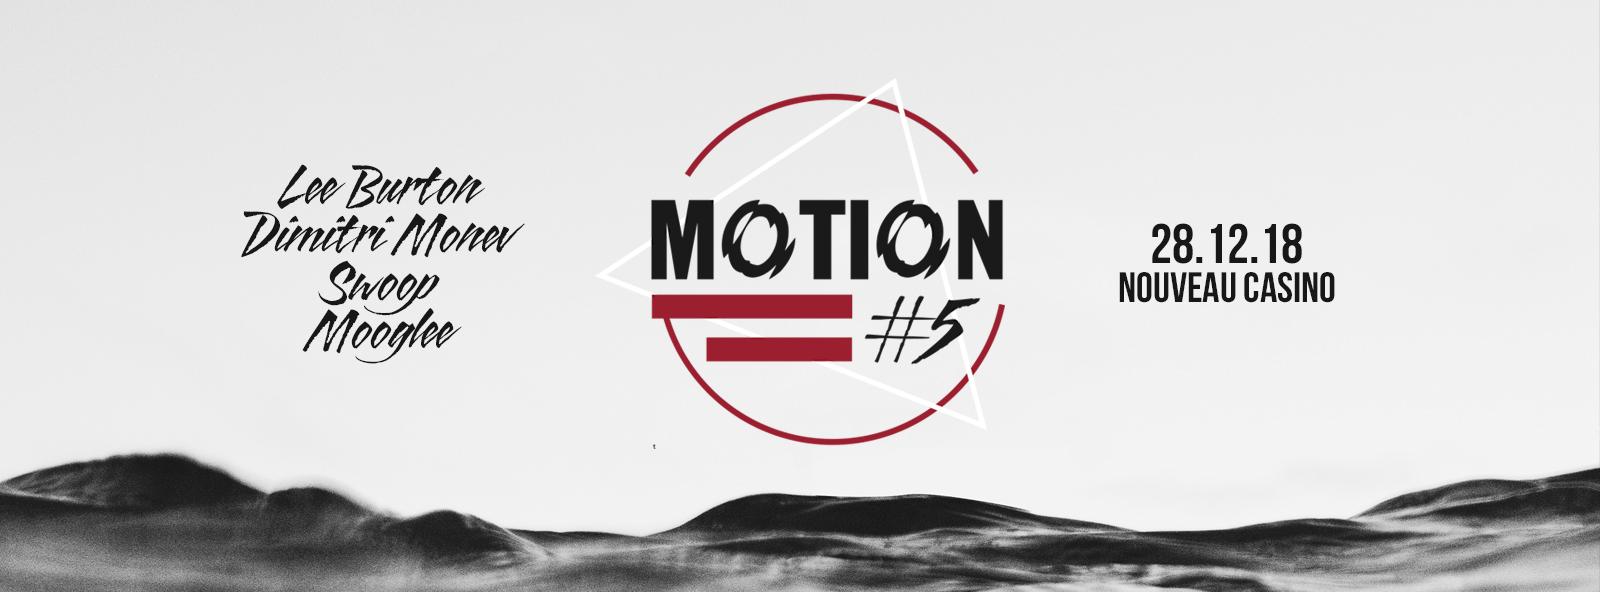 Motion #5 w/ Lee Burton, Dimitri Monev, Mooglee, Swoop